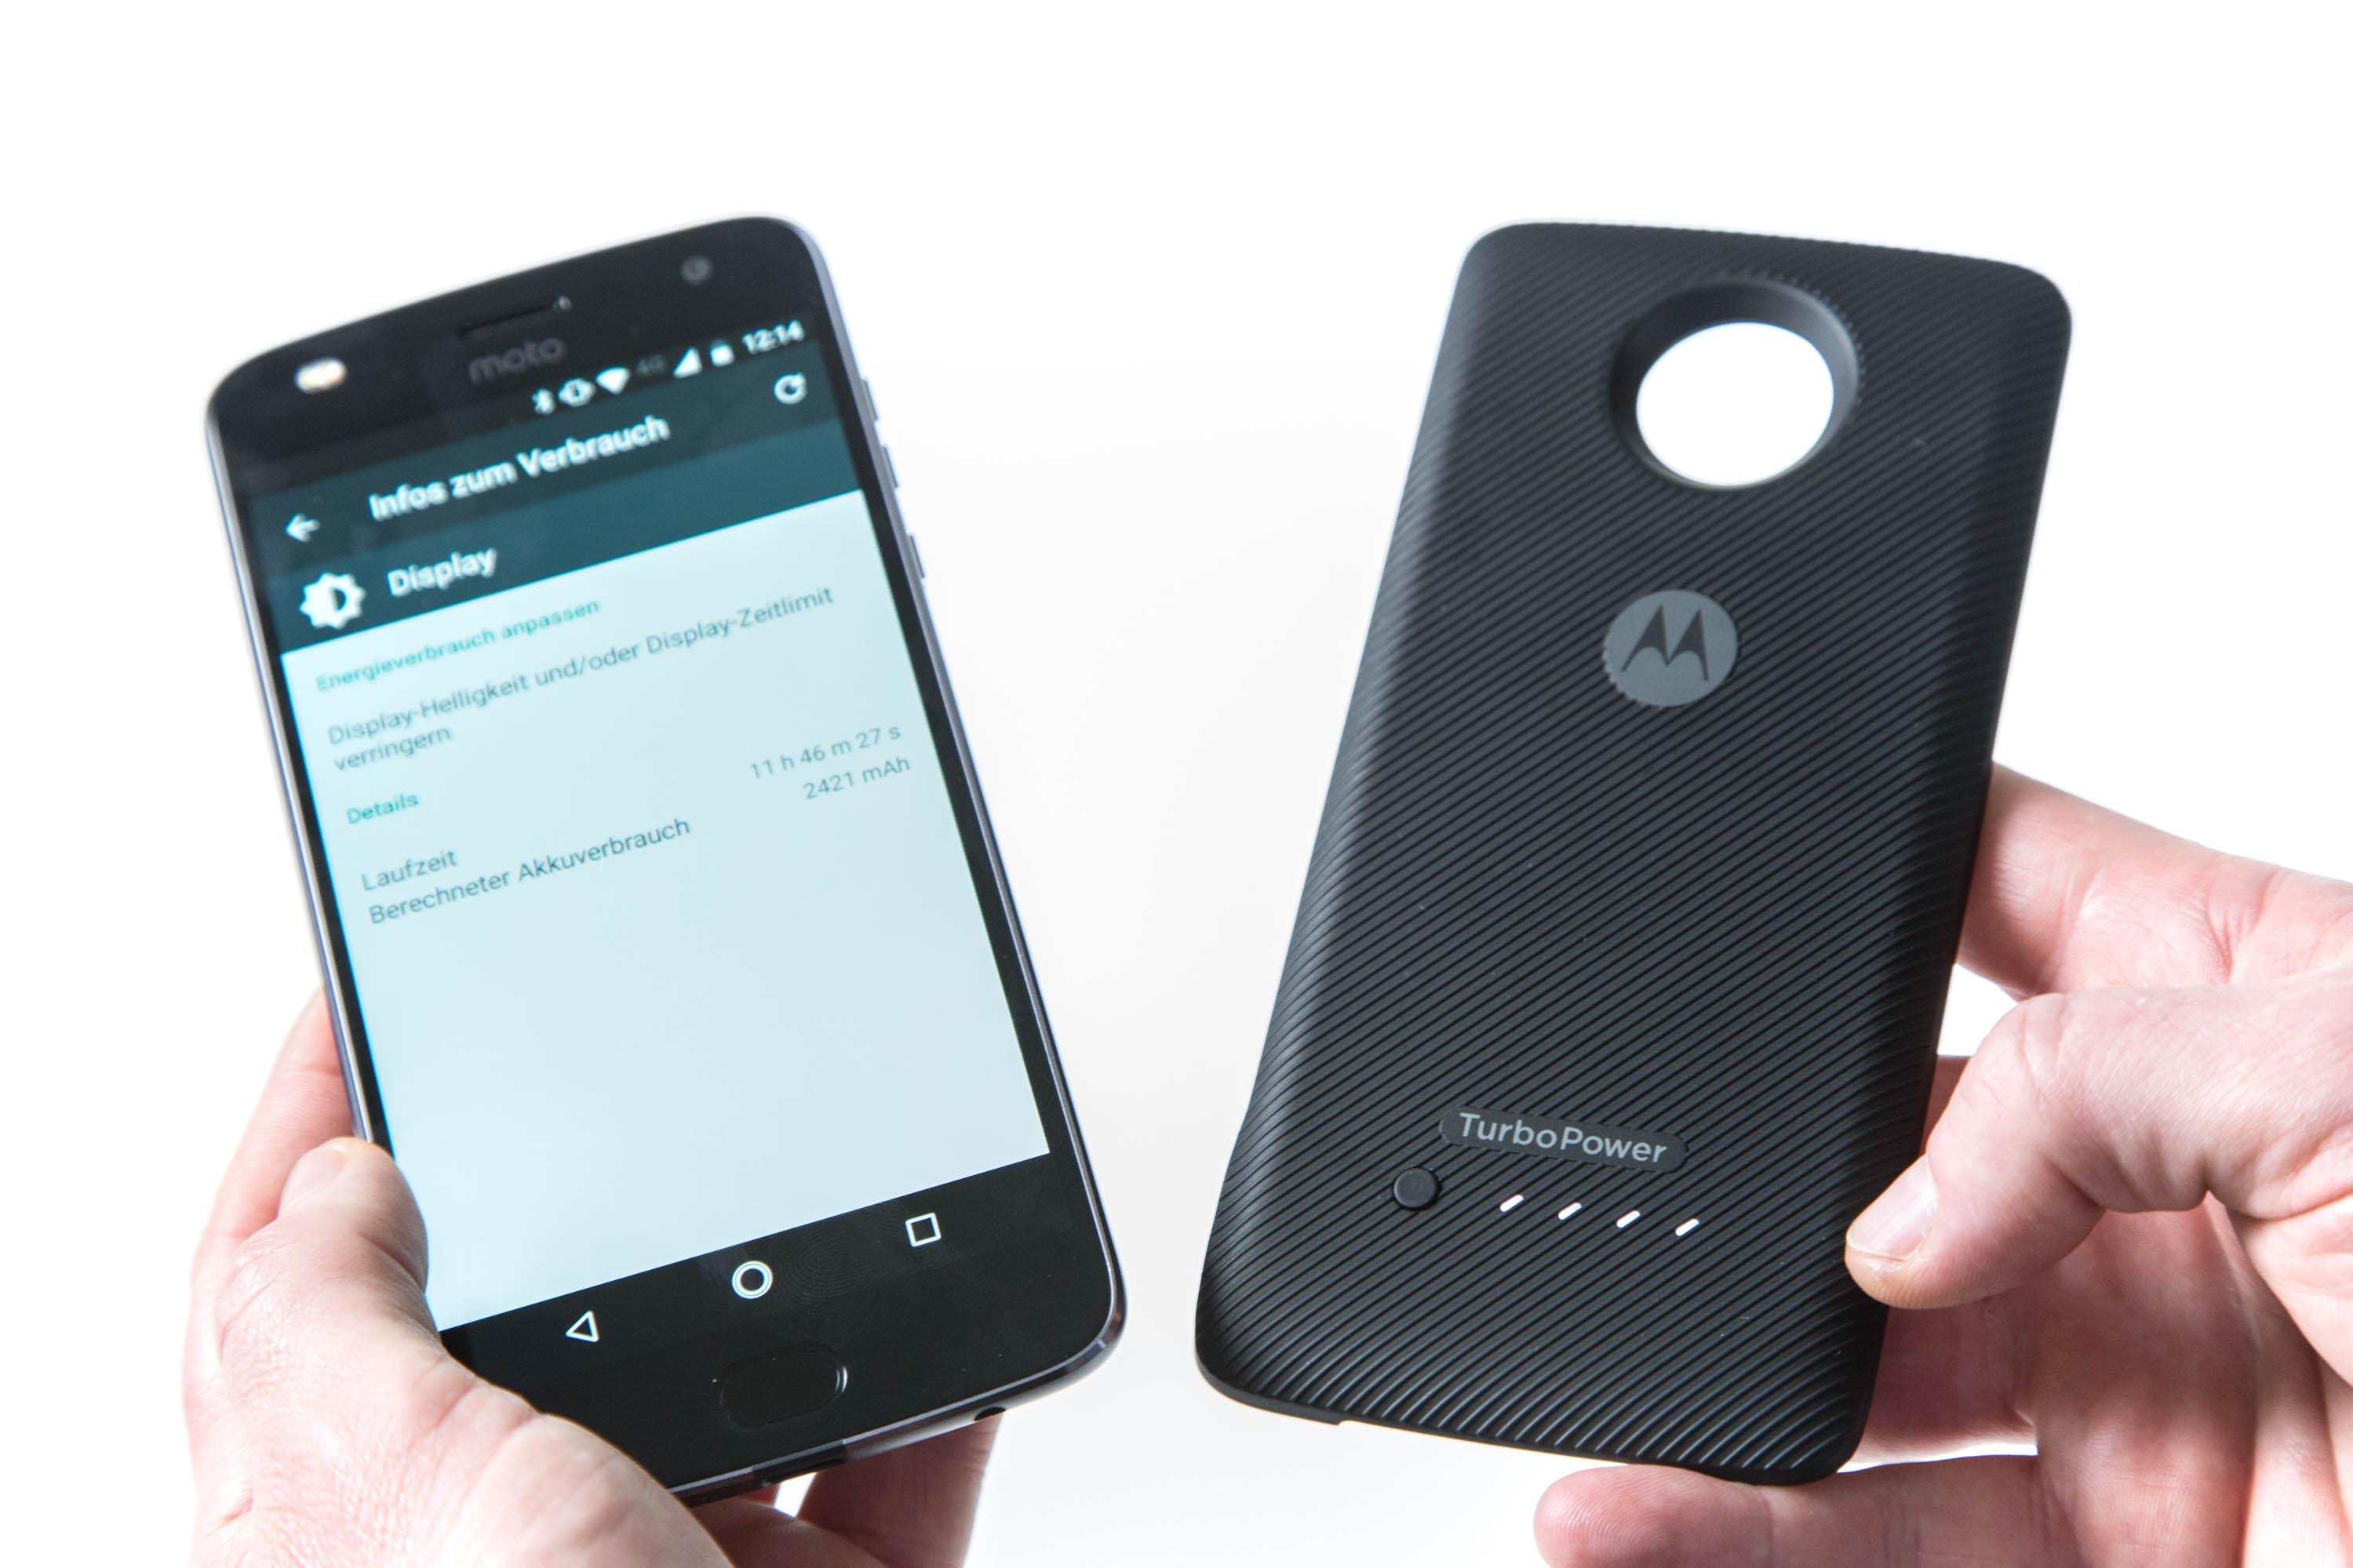 Modulare Smartphones: Lenovo kann Moto-Mods-Versprechen nicht halten - Lenovos Turbo Power Pack Mod (Bild: Martin Wolf/Goldm.de)